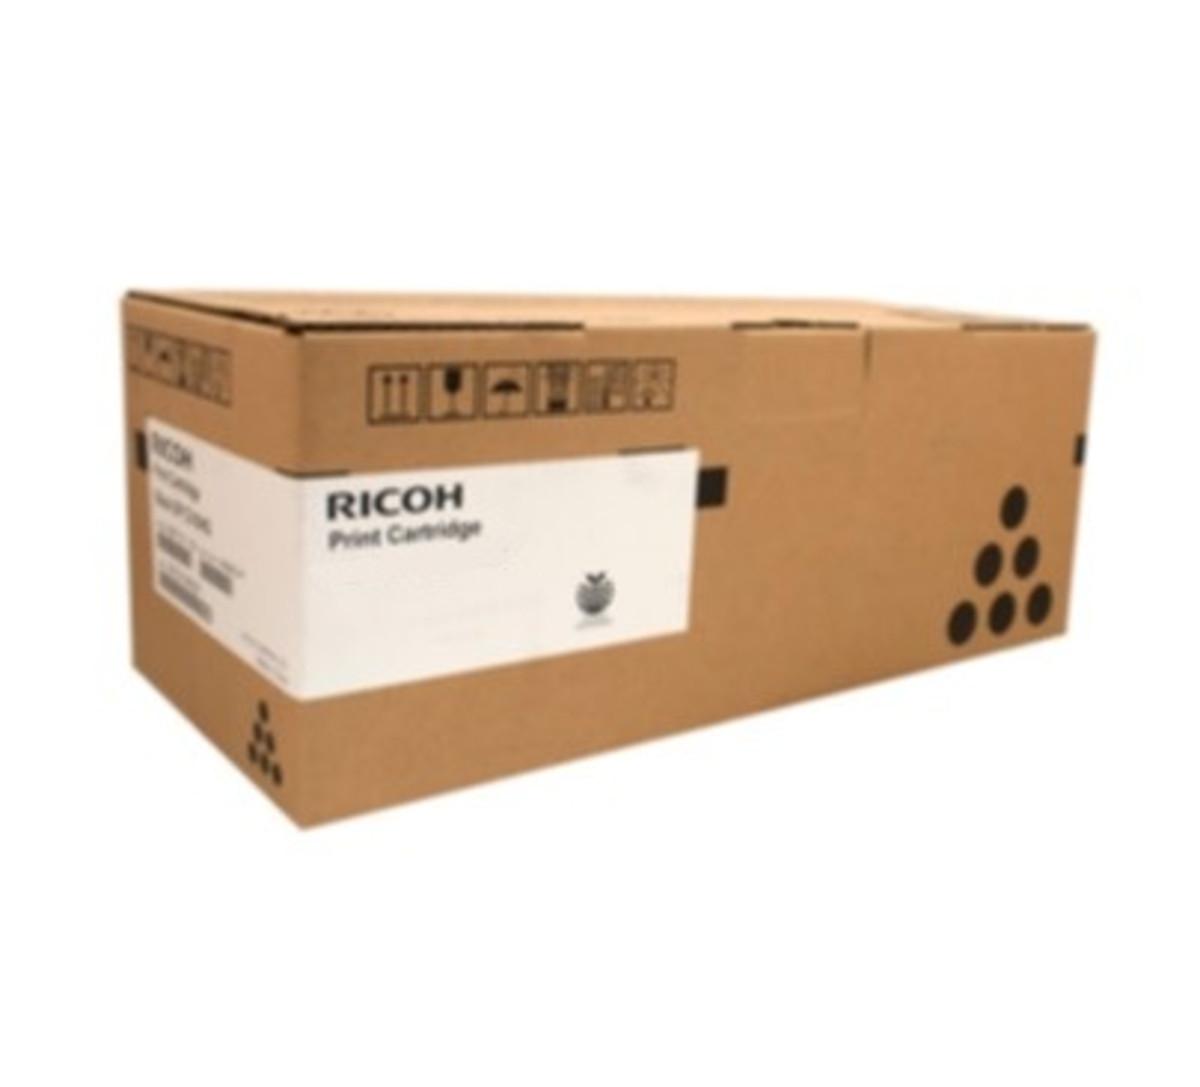 Ricoh 842024 Black Toner Cartridge